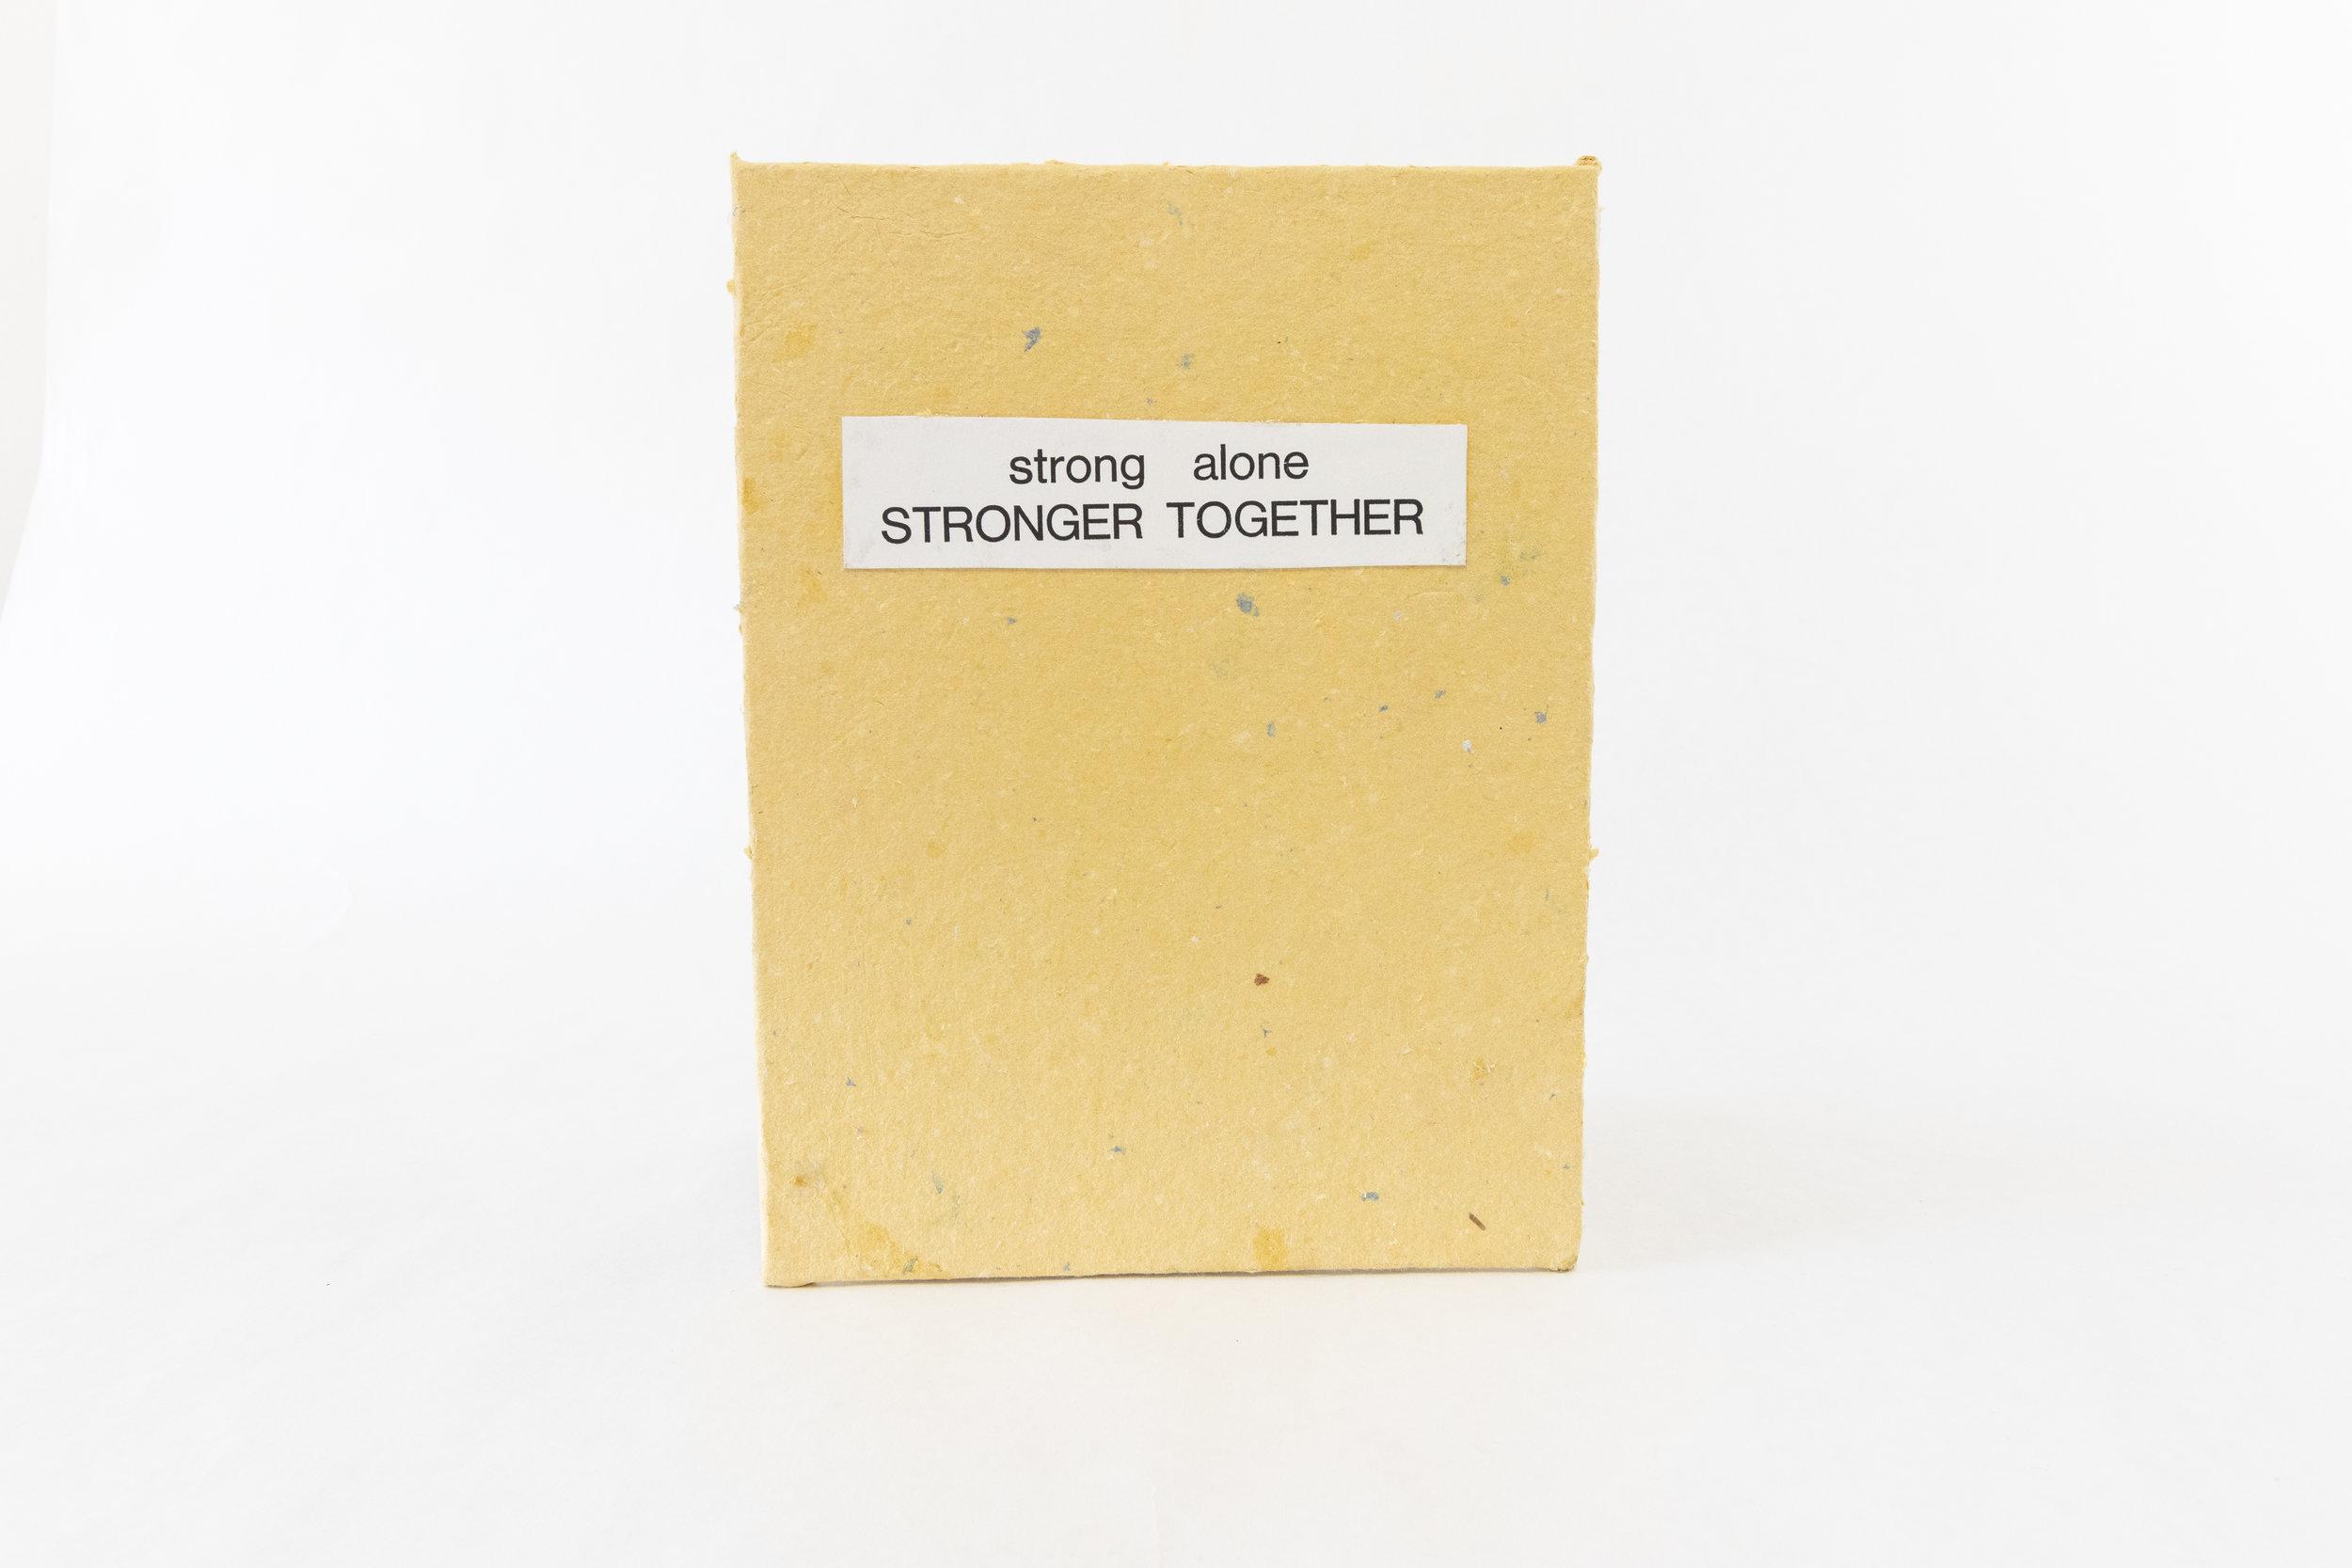 "Nicole Dotson, ""strong alone STRONGER TOGETHER,"" Cotton paper, 2019, Kalamazoo, MI"